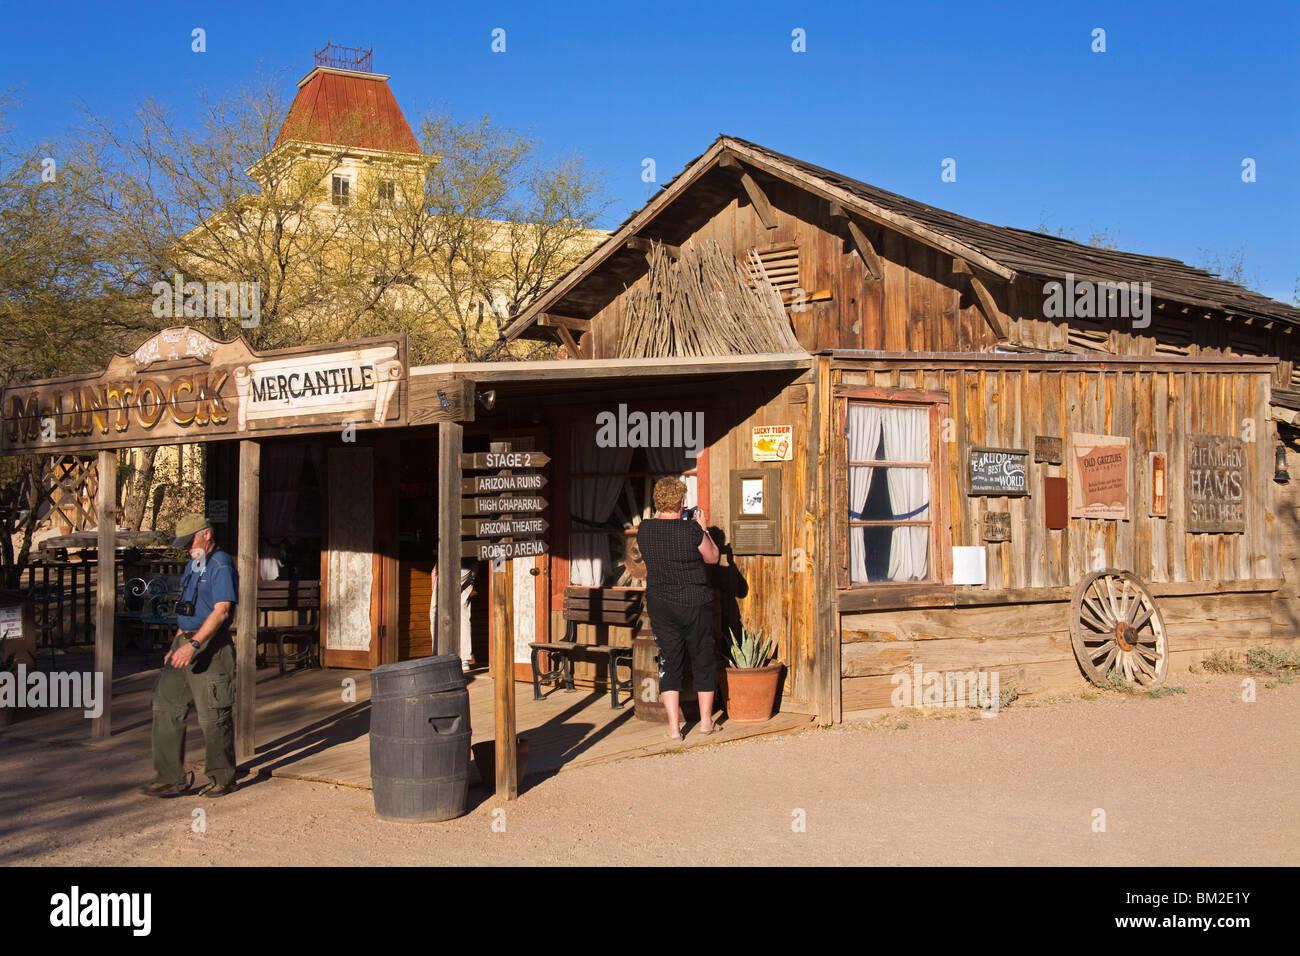 Old Tucson Studios, Tucson, Arizona, USA - Stock Image